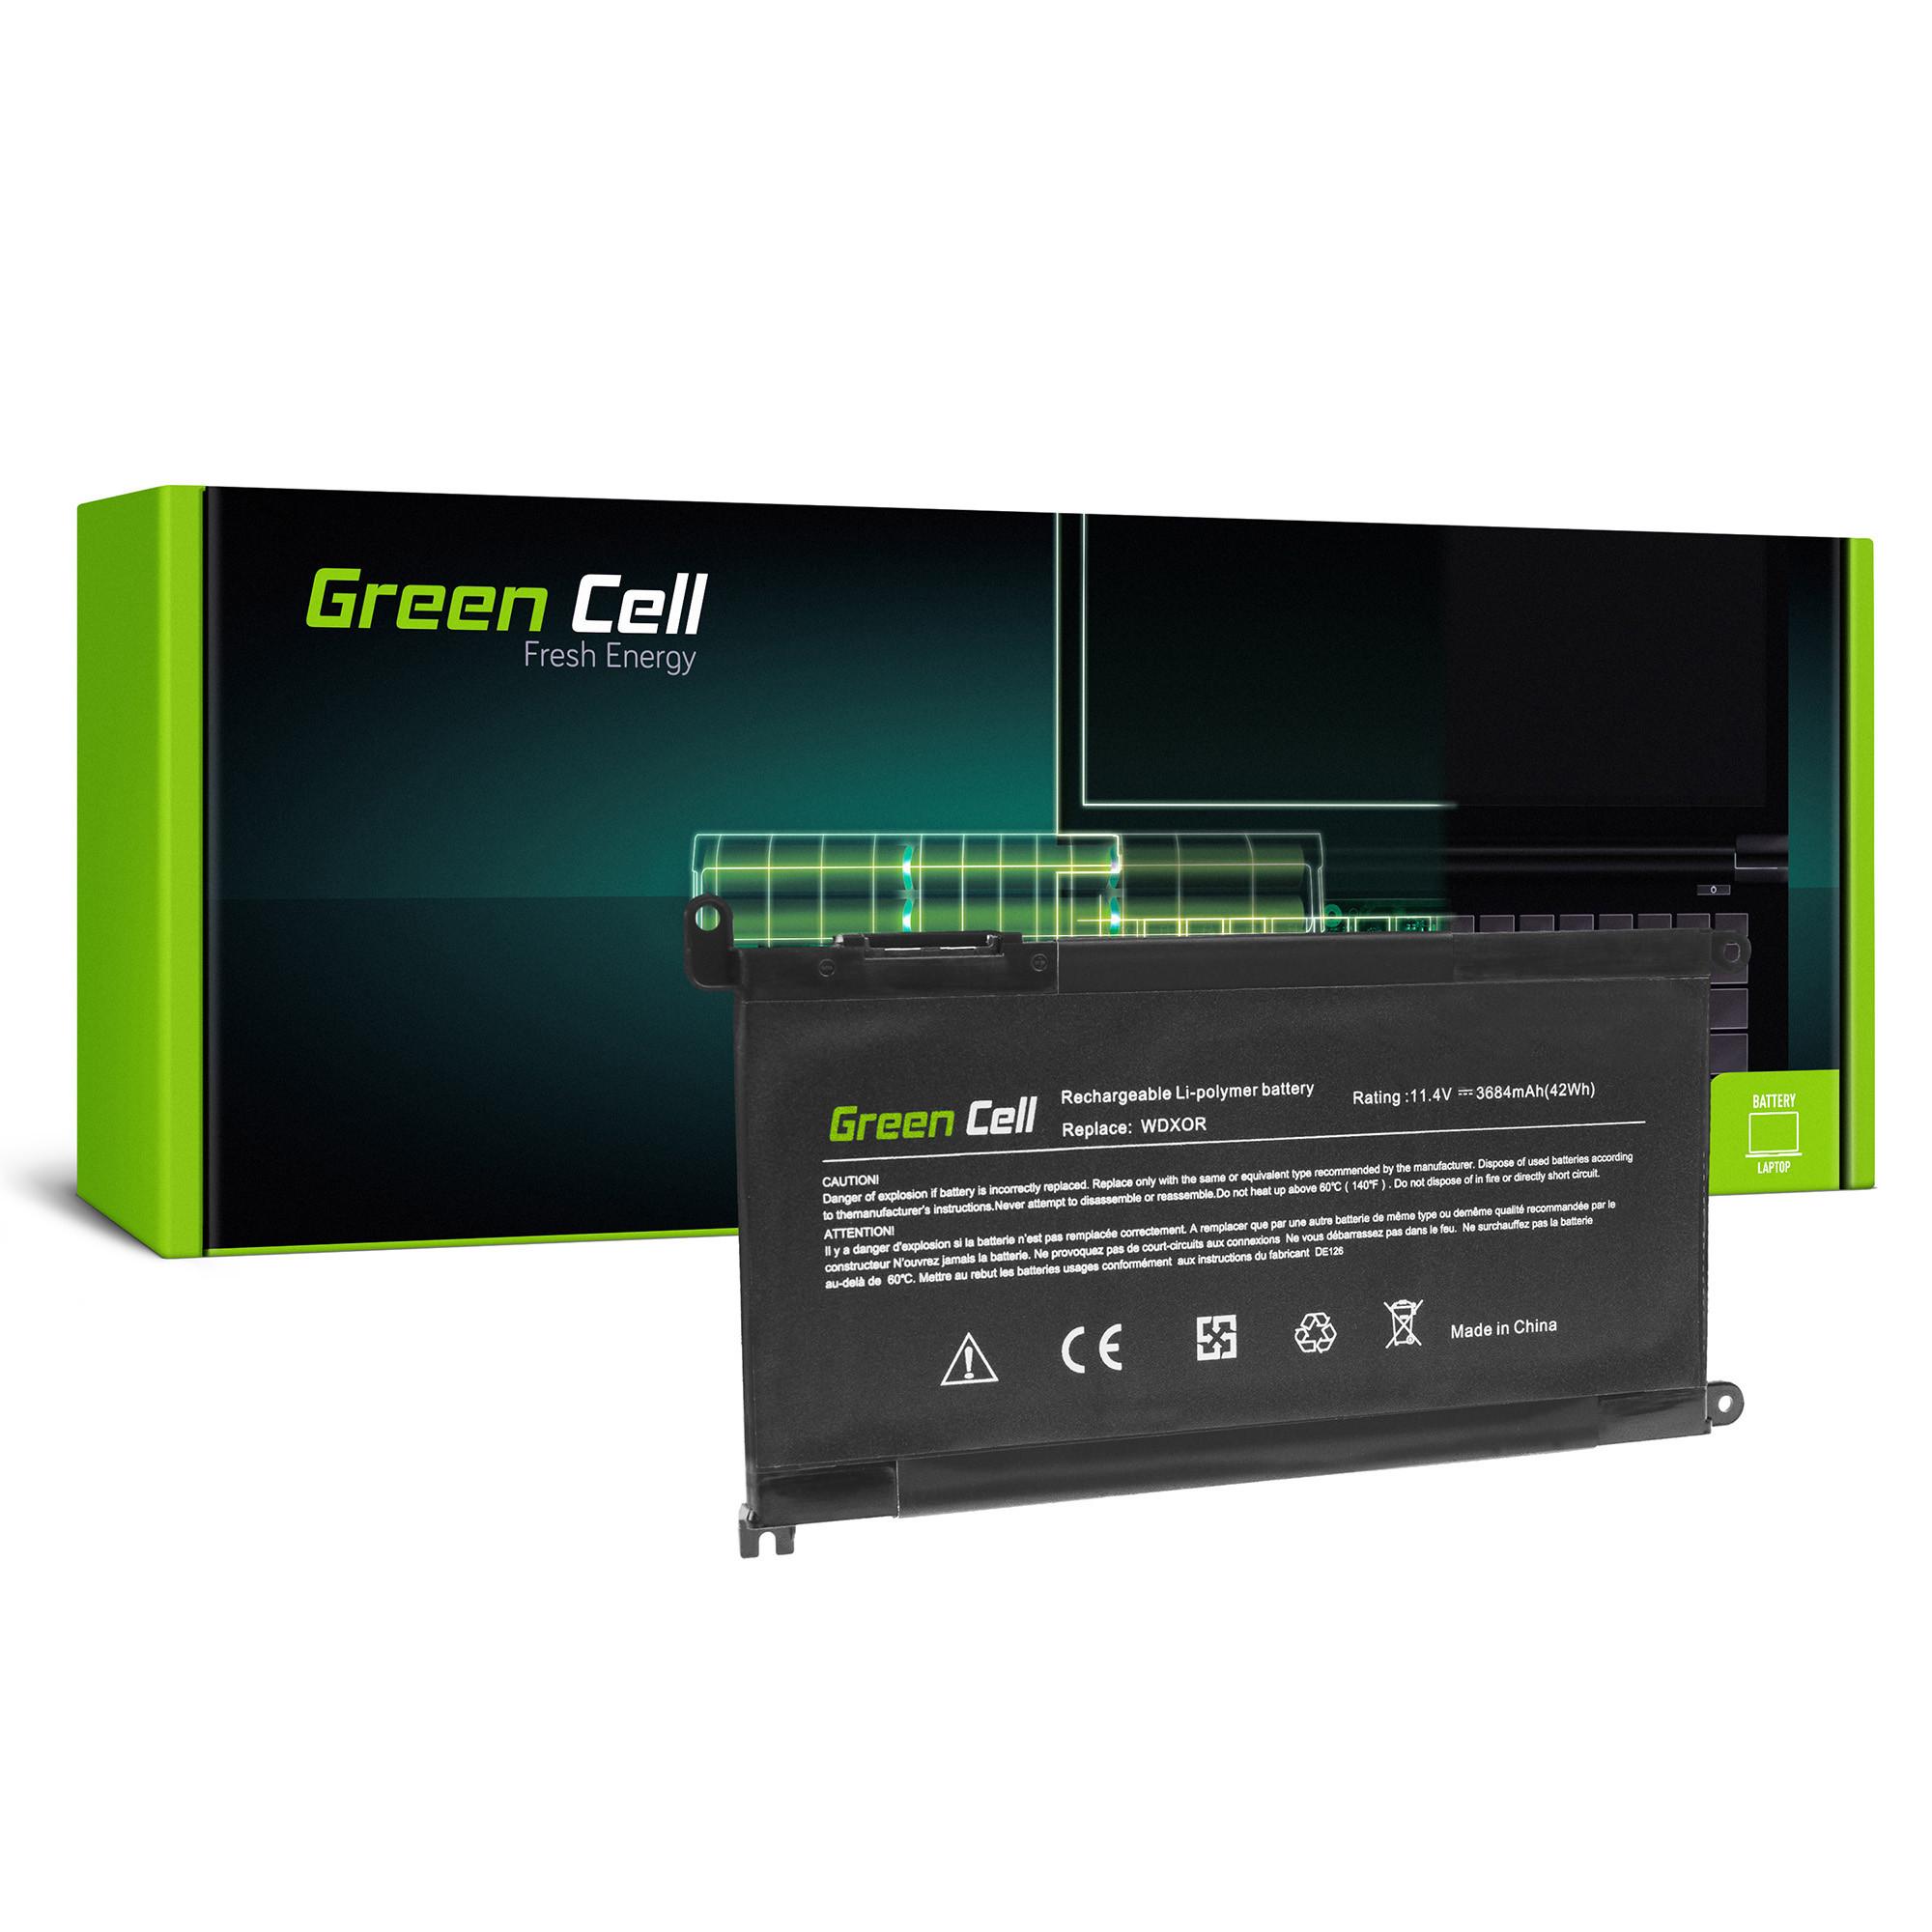 Green Cell DE126 Baterie Dell WDX0R WDXOR, Dell Inspiron 13 5368 5378 5379 14 5482 15 5565 5567 5568 5570 5578 5579 7560 7570 17 5770 3684mAh Li-ion - neoriginální